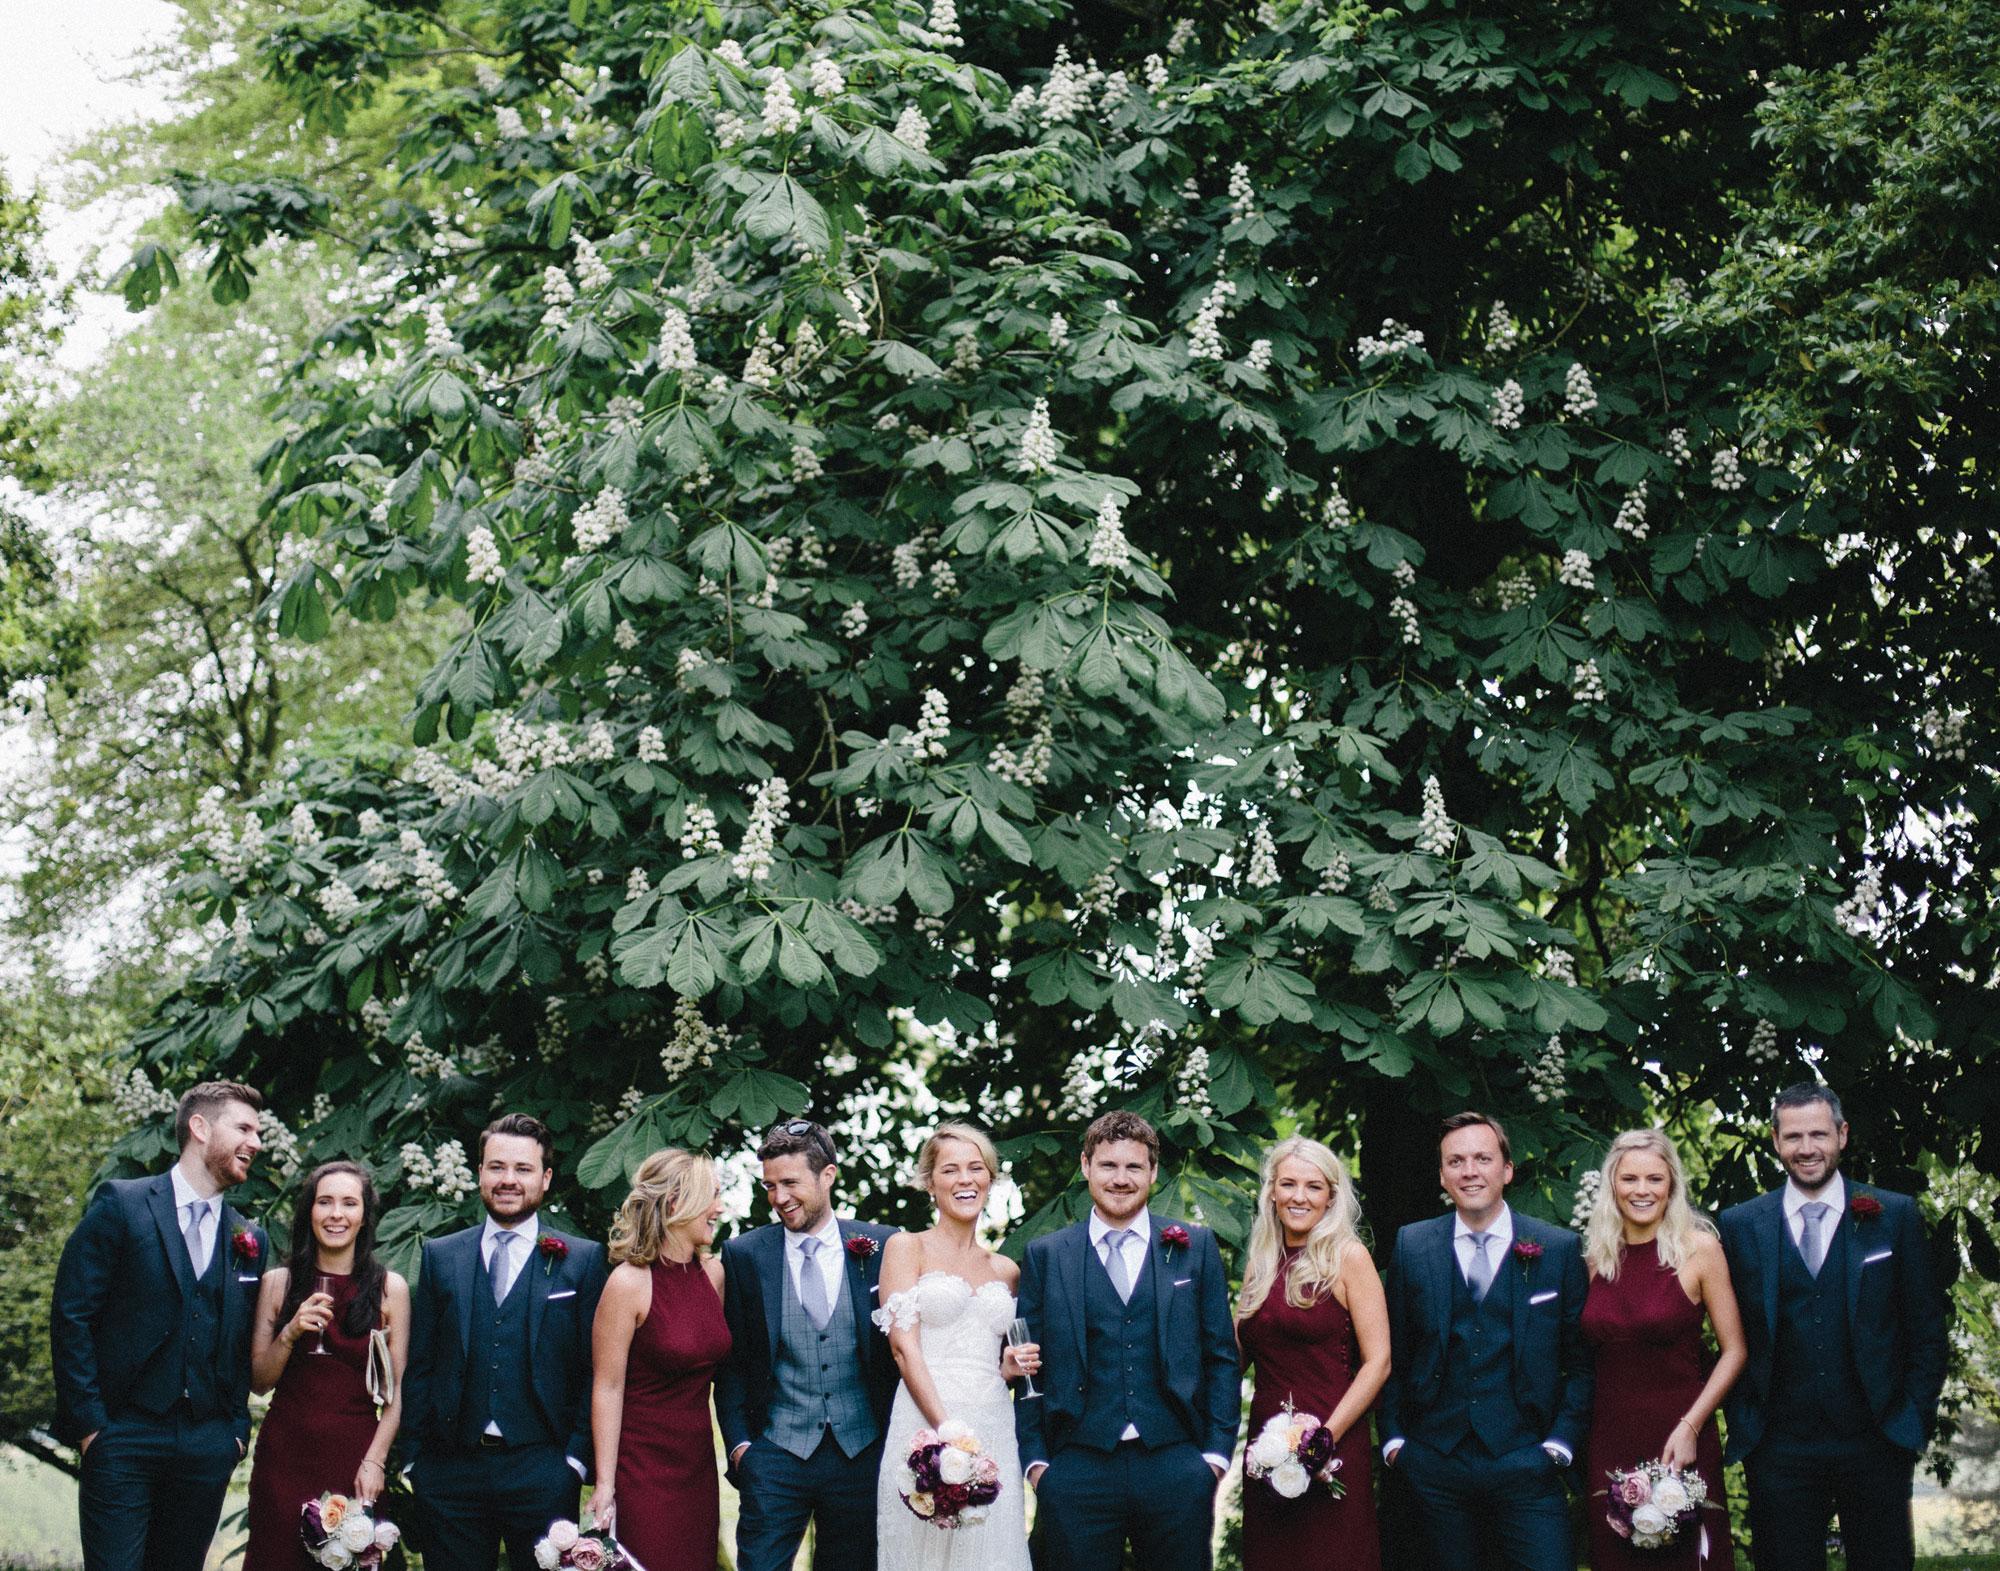 cool-modern-bridal-party-wedding-photography-ireland.jpg